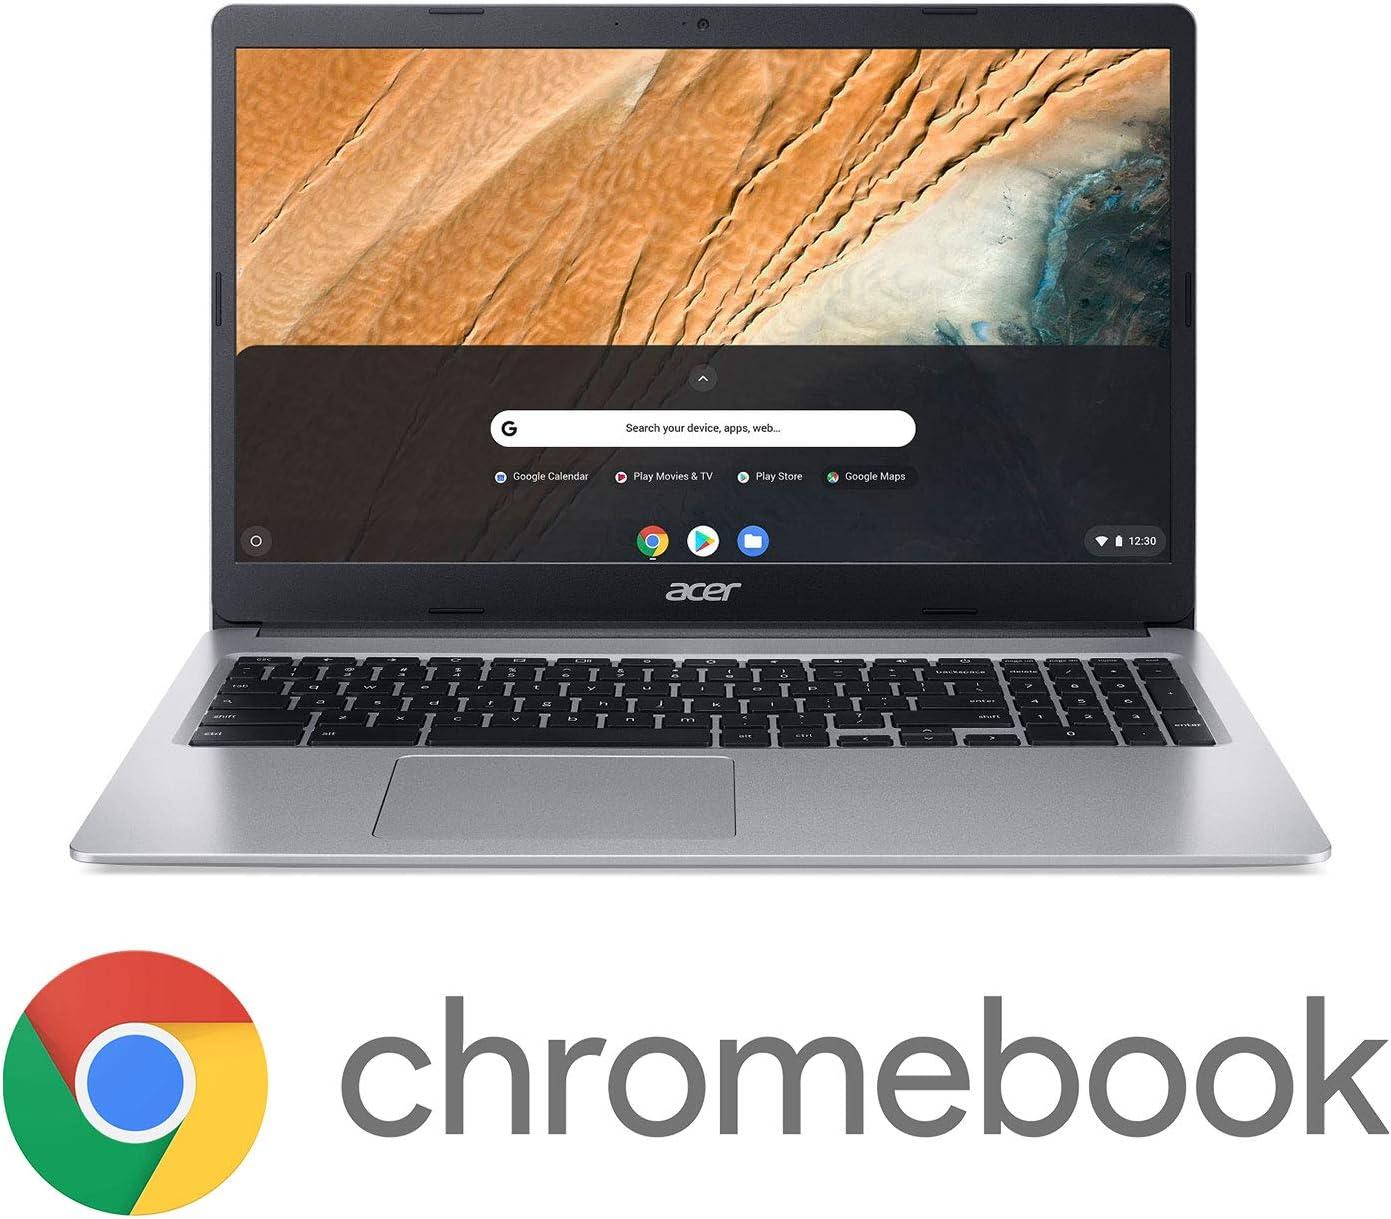 "Acer Chromebook 315, Intel Celeron N4000, 15.6"" HD Display, 4GB LPDDR4, 64GB eMMC, Gigabit WiFi, Google Chrome, CB315-3H-C4QE"